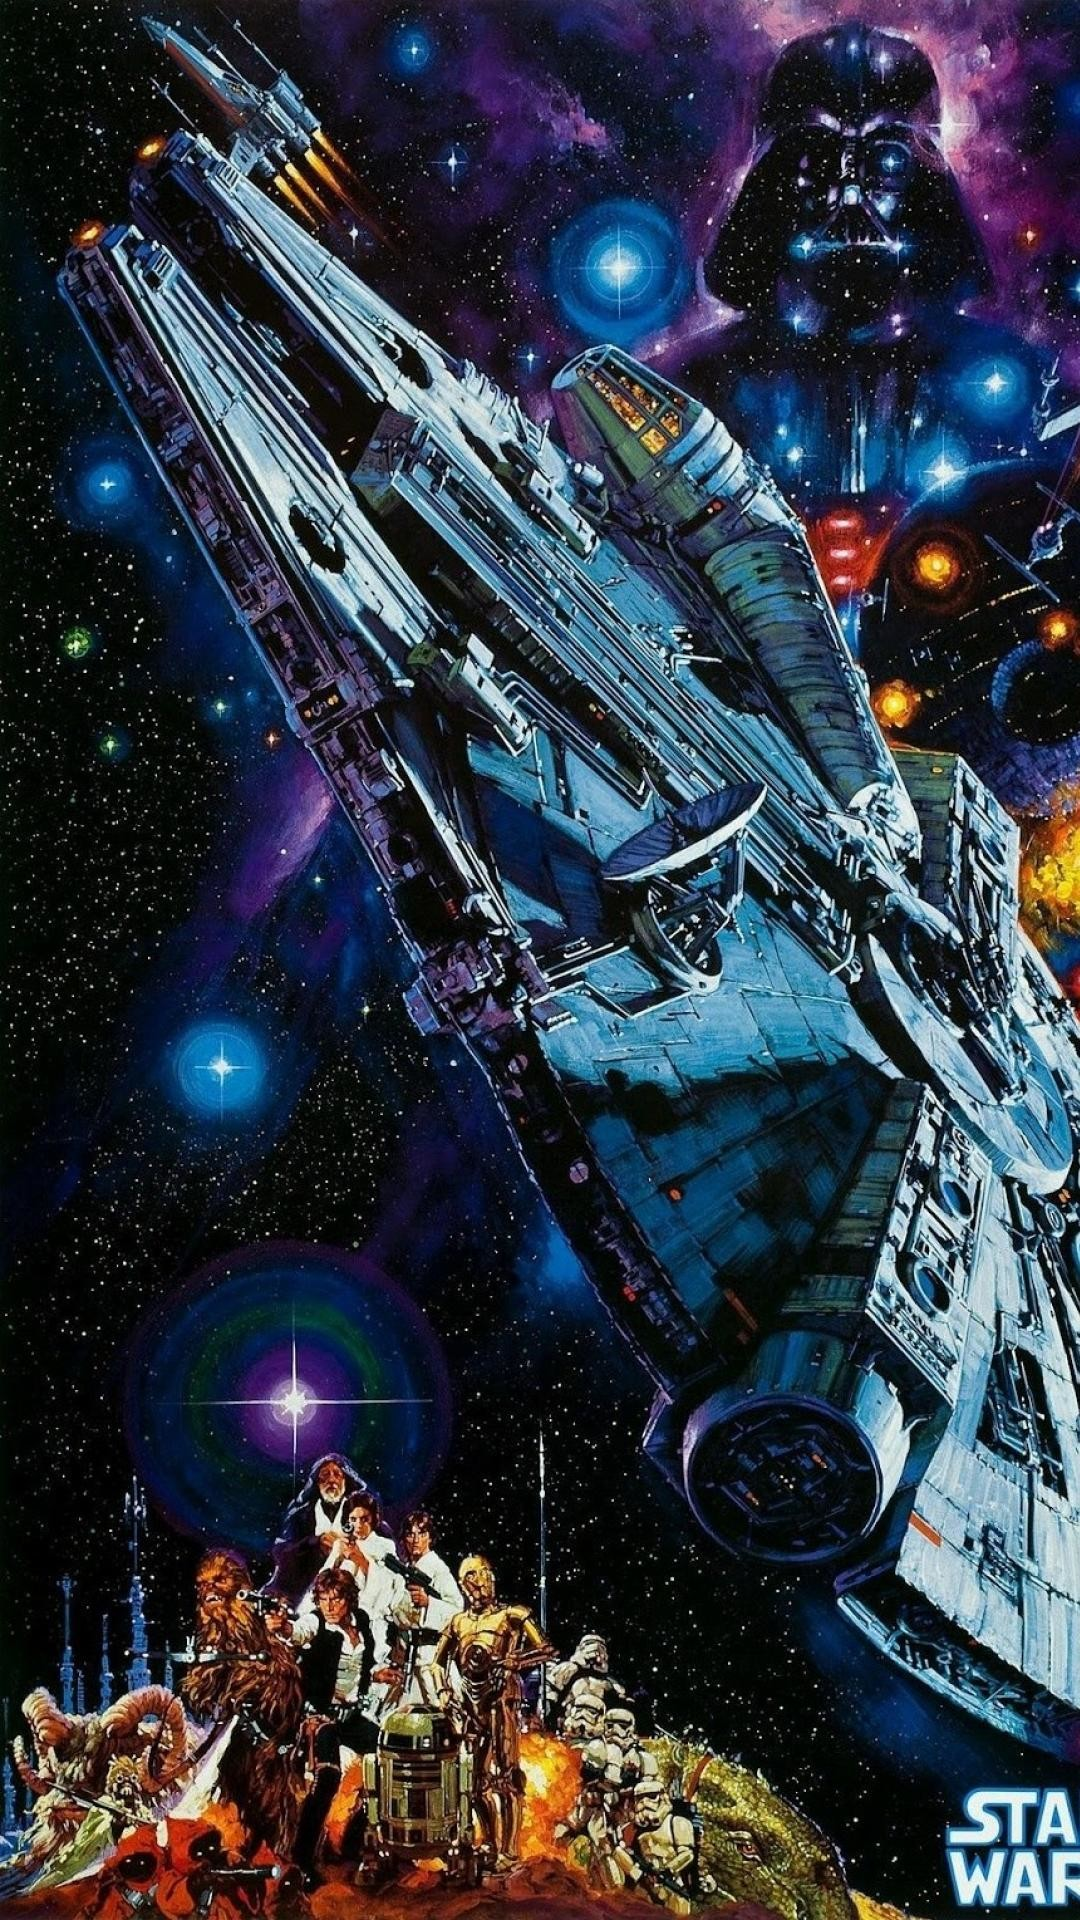 Retro Star Wars Iphone Wallpaper